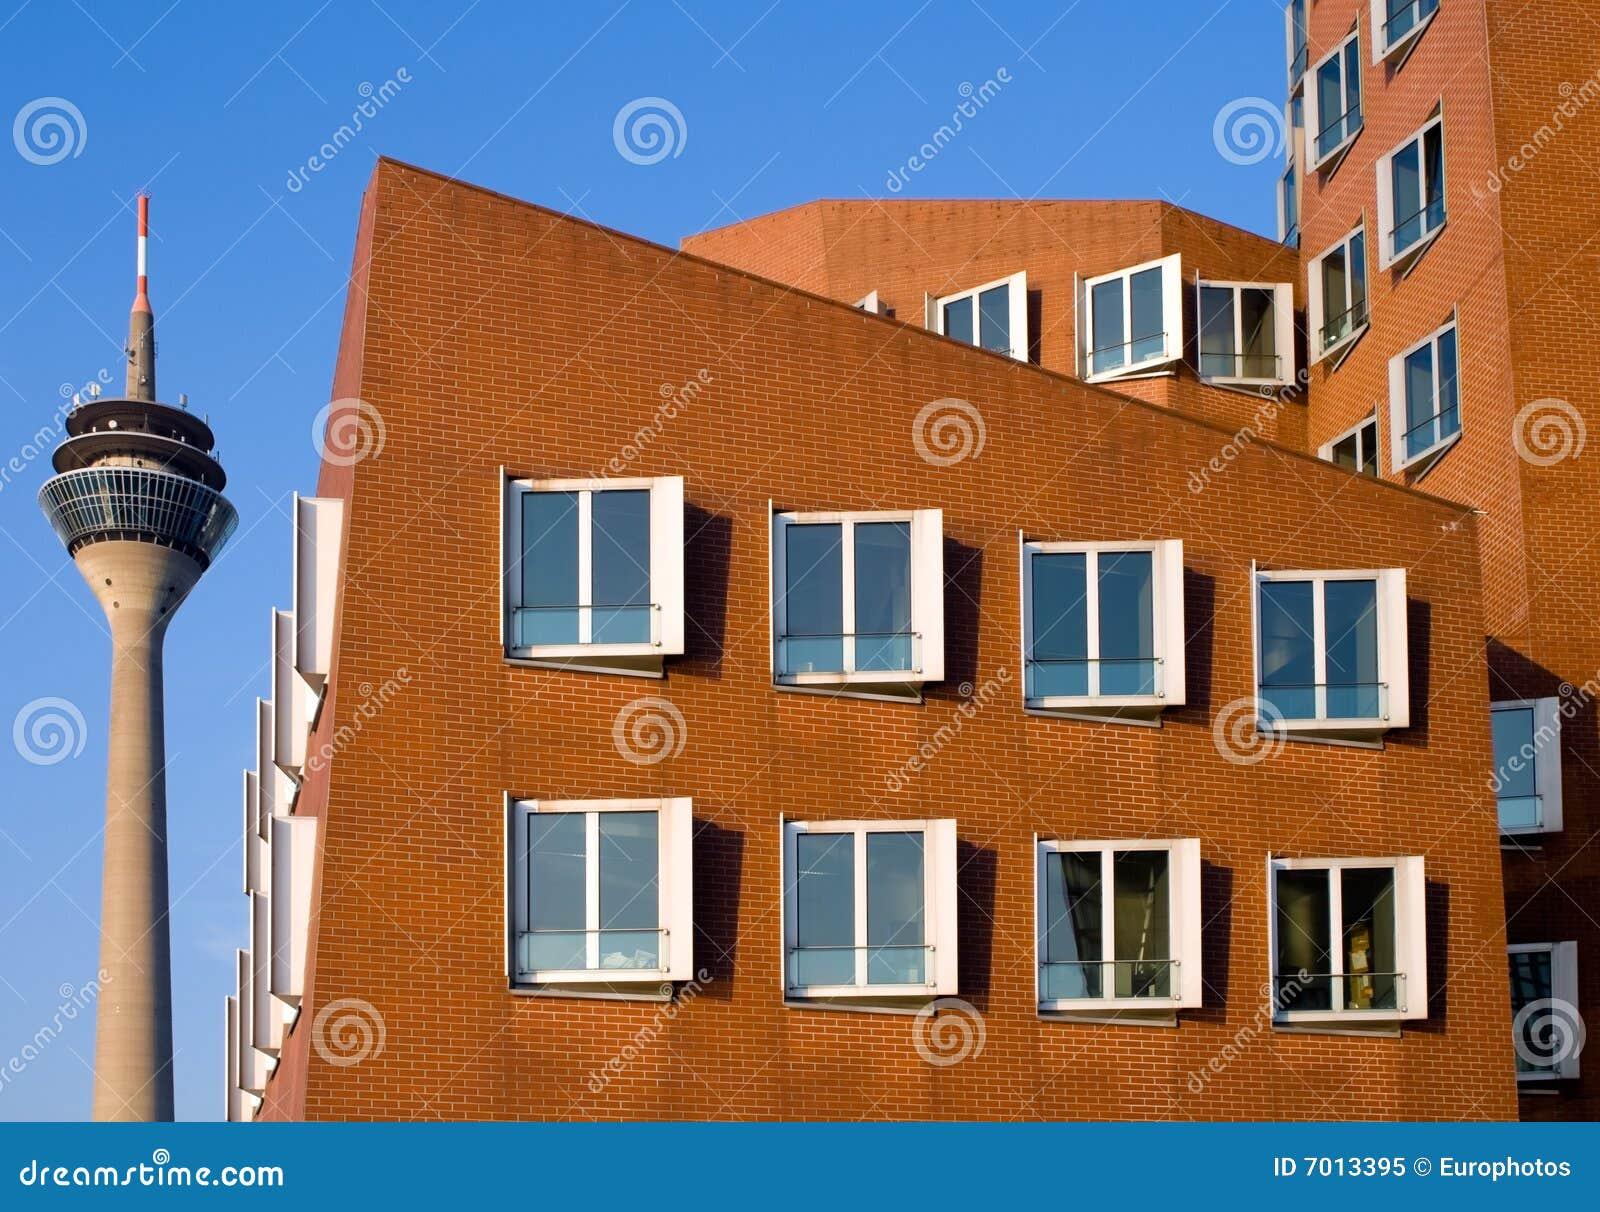 Architettura moderna a dusseldorf immagine editoriale - Architettura casa moderna ...